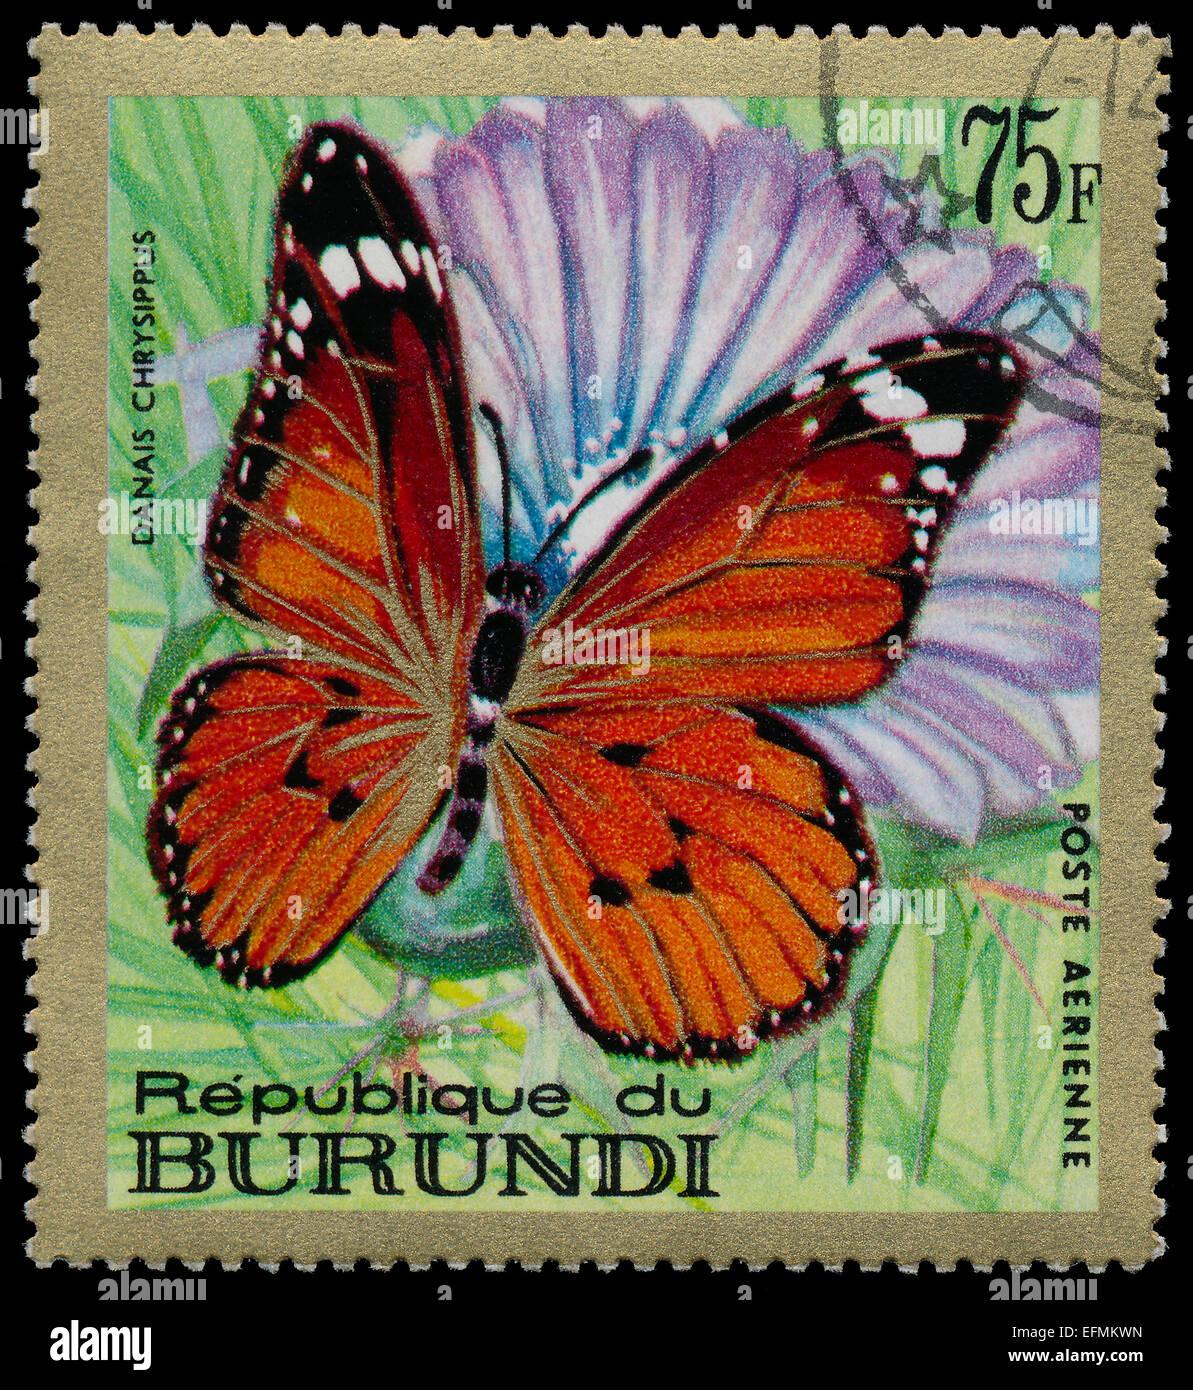 REPUBLIC OF BURUNDI - CIRCA 1968: A stamp printed in Burundi shows a butterfly Danais chrysippus , circa 1968 Stock Photo